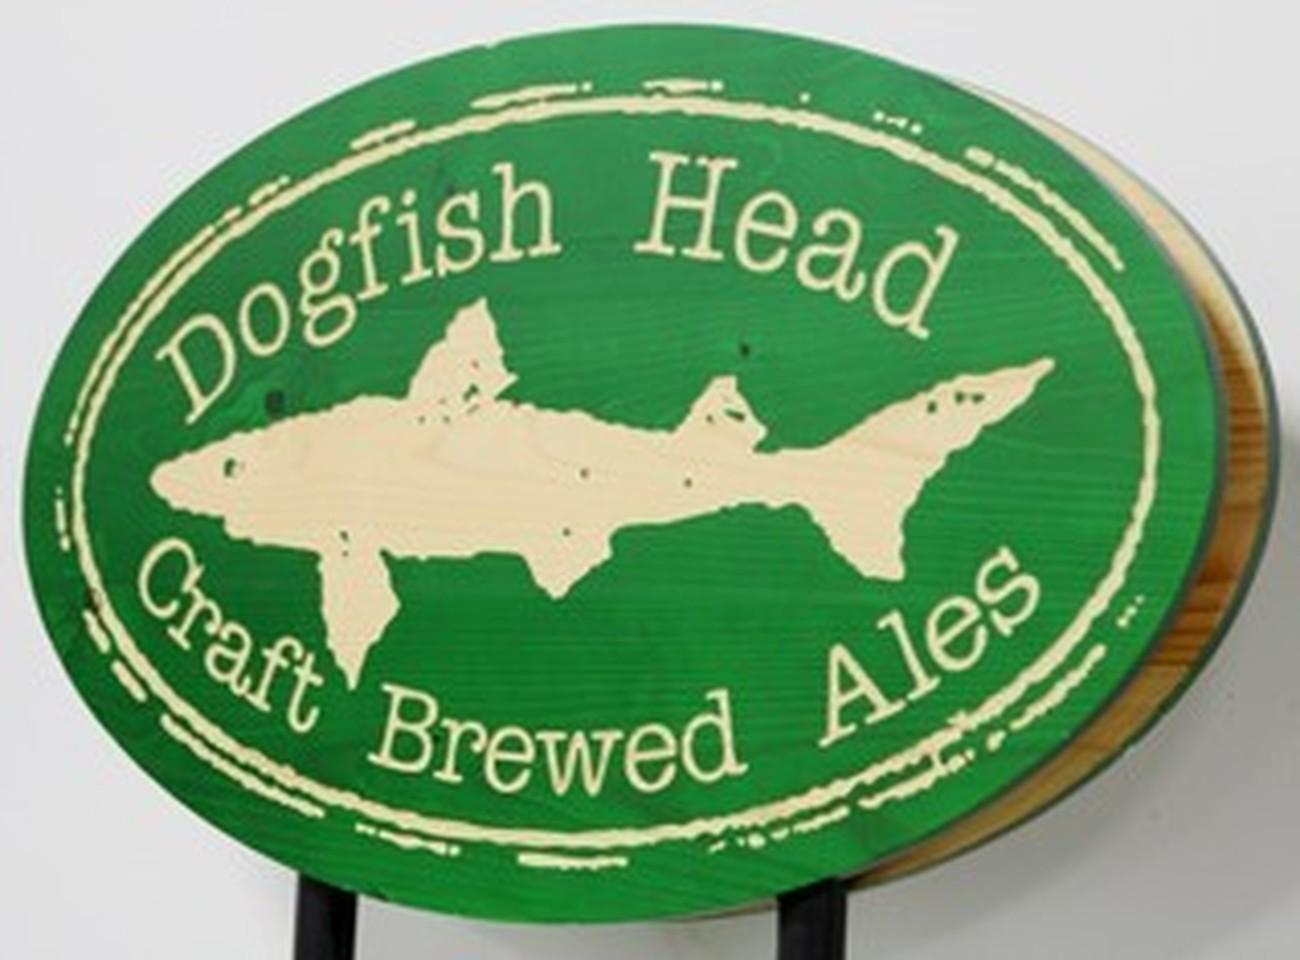 Dogfish Head Careers